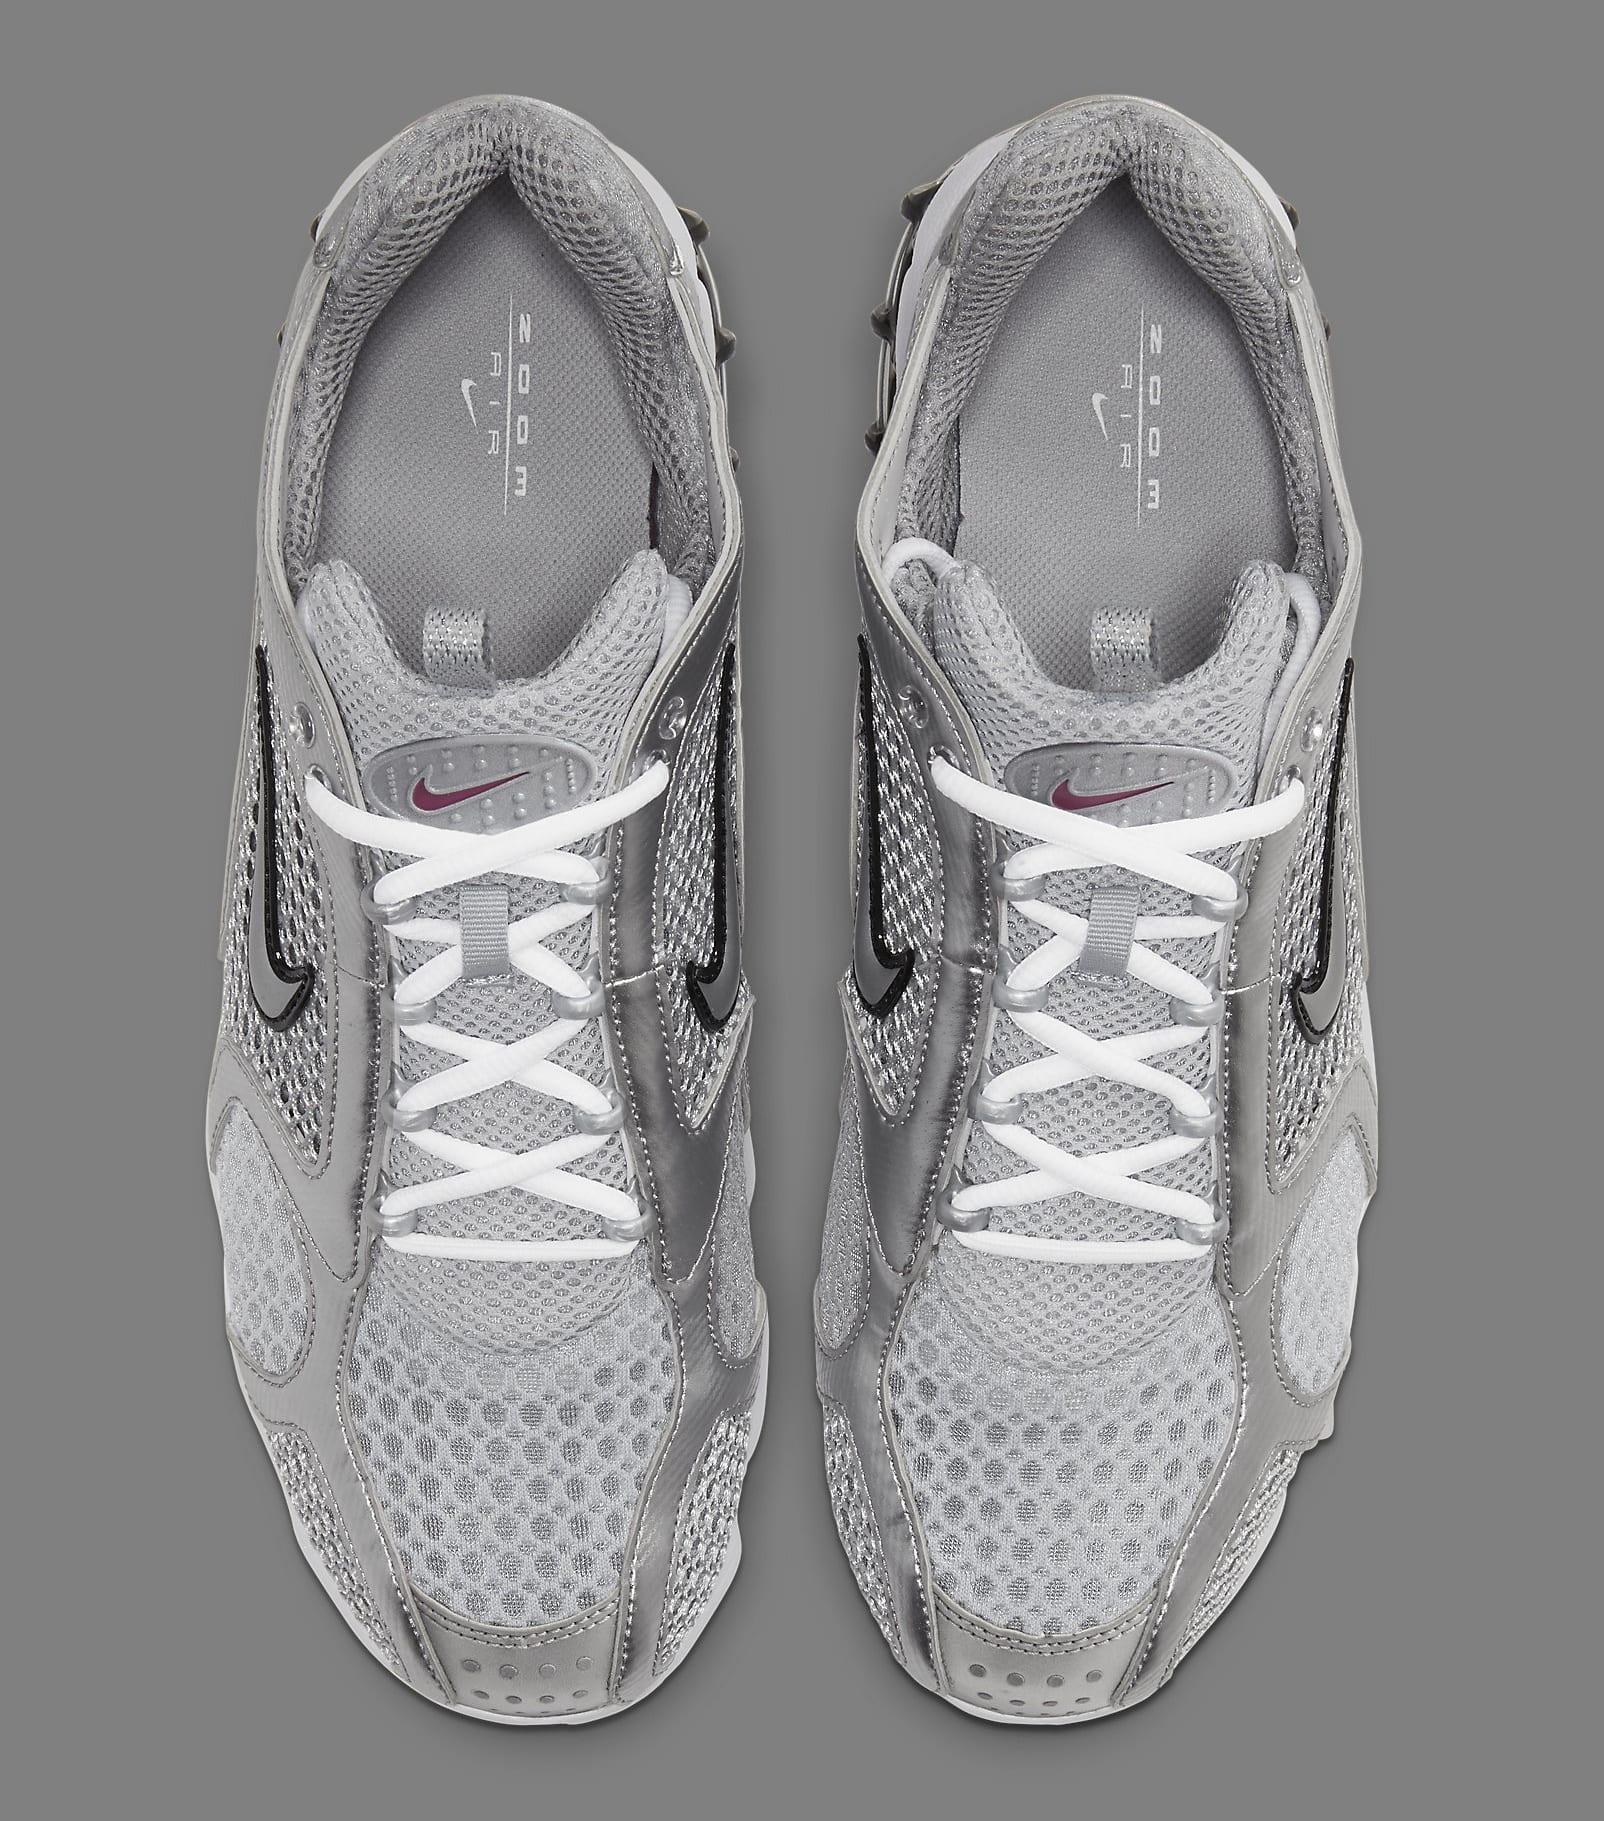 Elegibilidad Piscina Compra  Nike Air Zoom Spiridon Caged 2 'Red' CJ1288-600 'Grey' CJ1288-001 Release |  Sole Collector